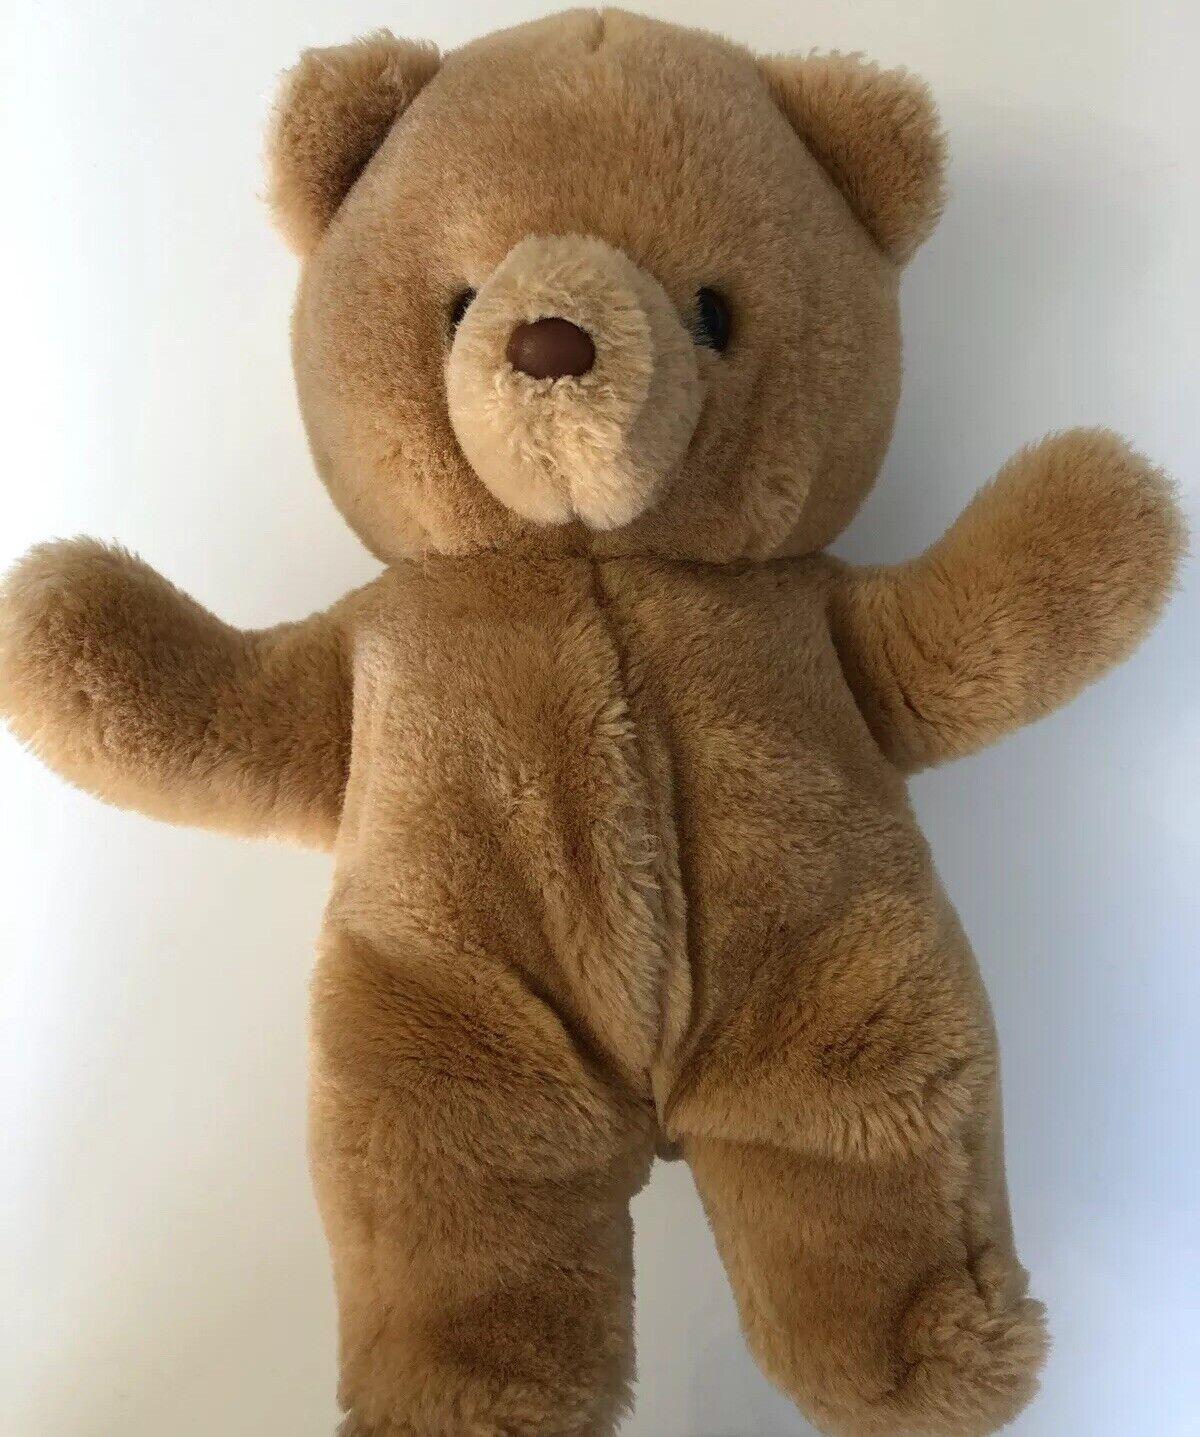 Russ Berrie Vintage HONEY Teddy Bear 592 Plush Stuffed Animal Light braun 14